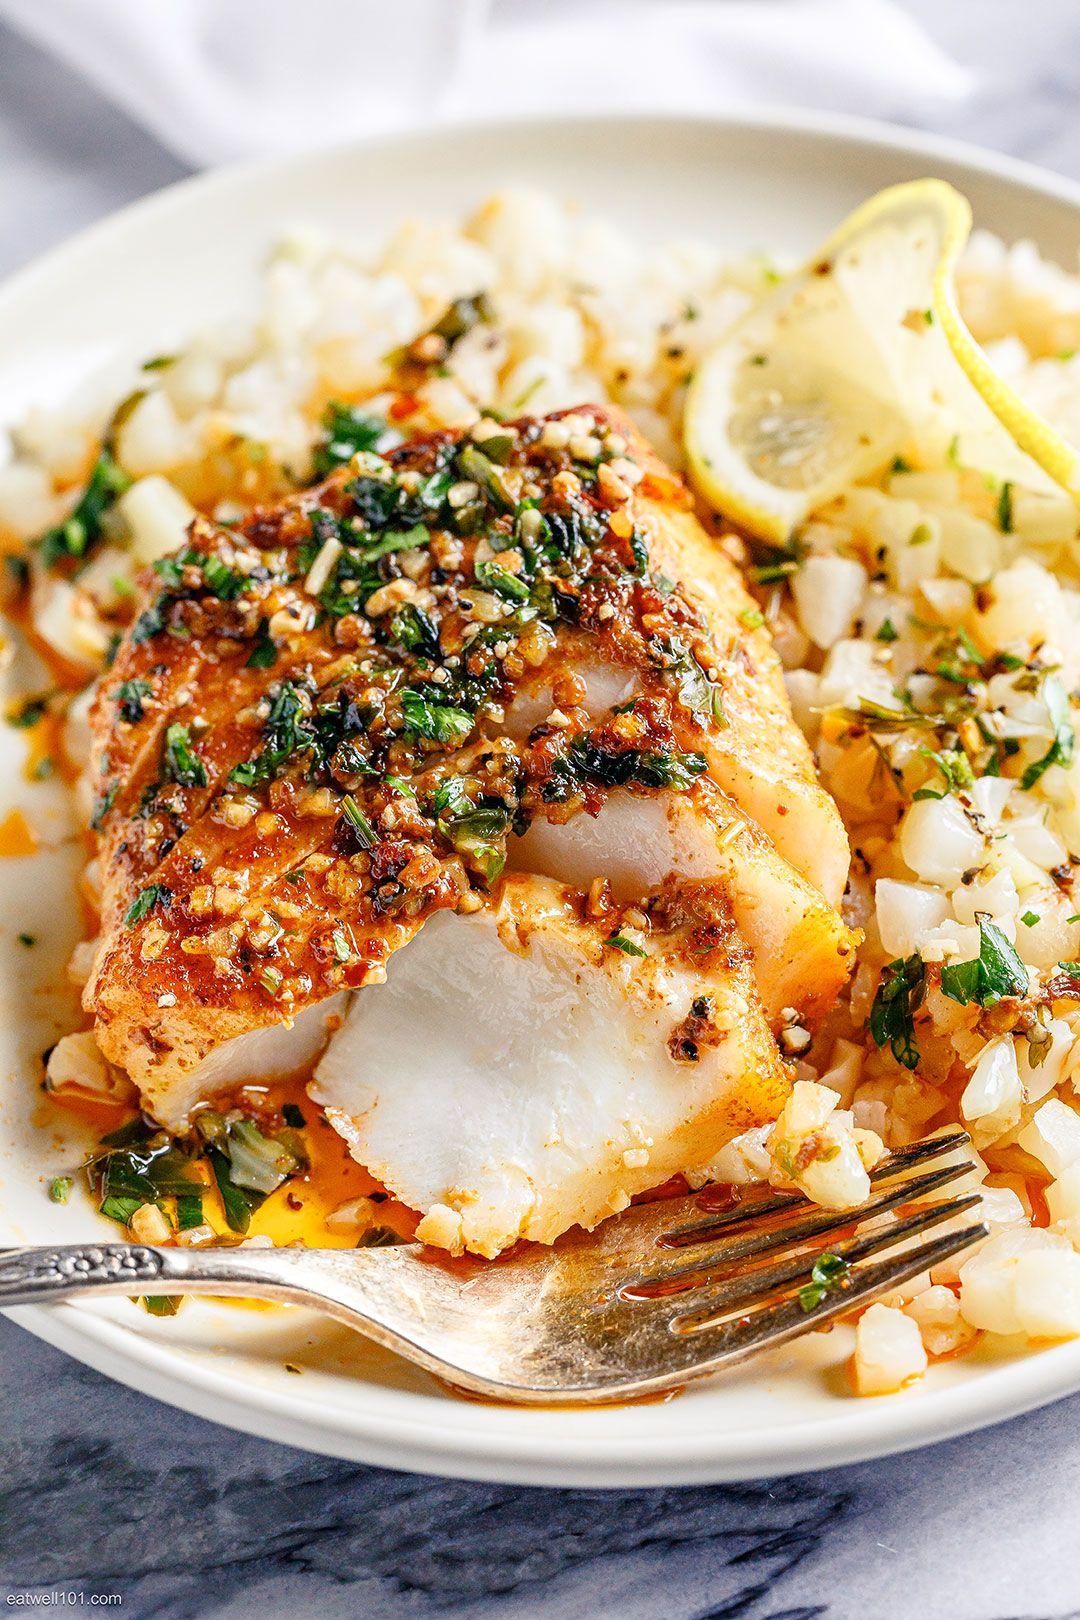 Lemon Garlic Butter Baked Cod Fillets Baked Cod Fish Recipe Eatwell101 This Lemon Garlic B In 2020 Cod Fish Recipes Baked Fish Recipes Baked Baked Cod Fillets